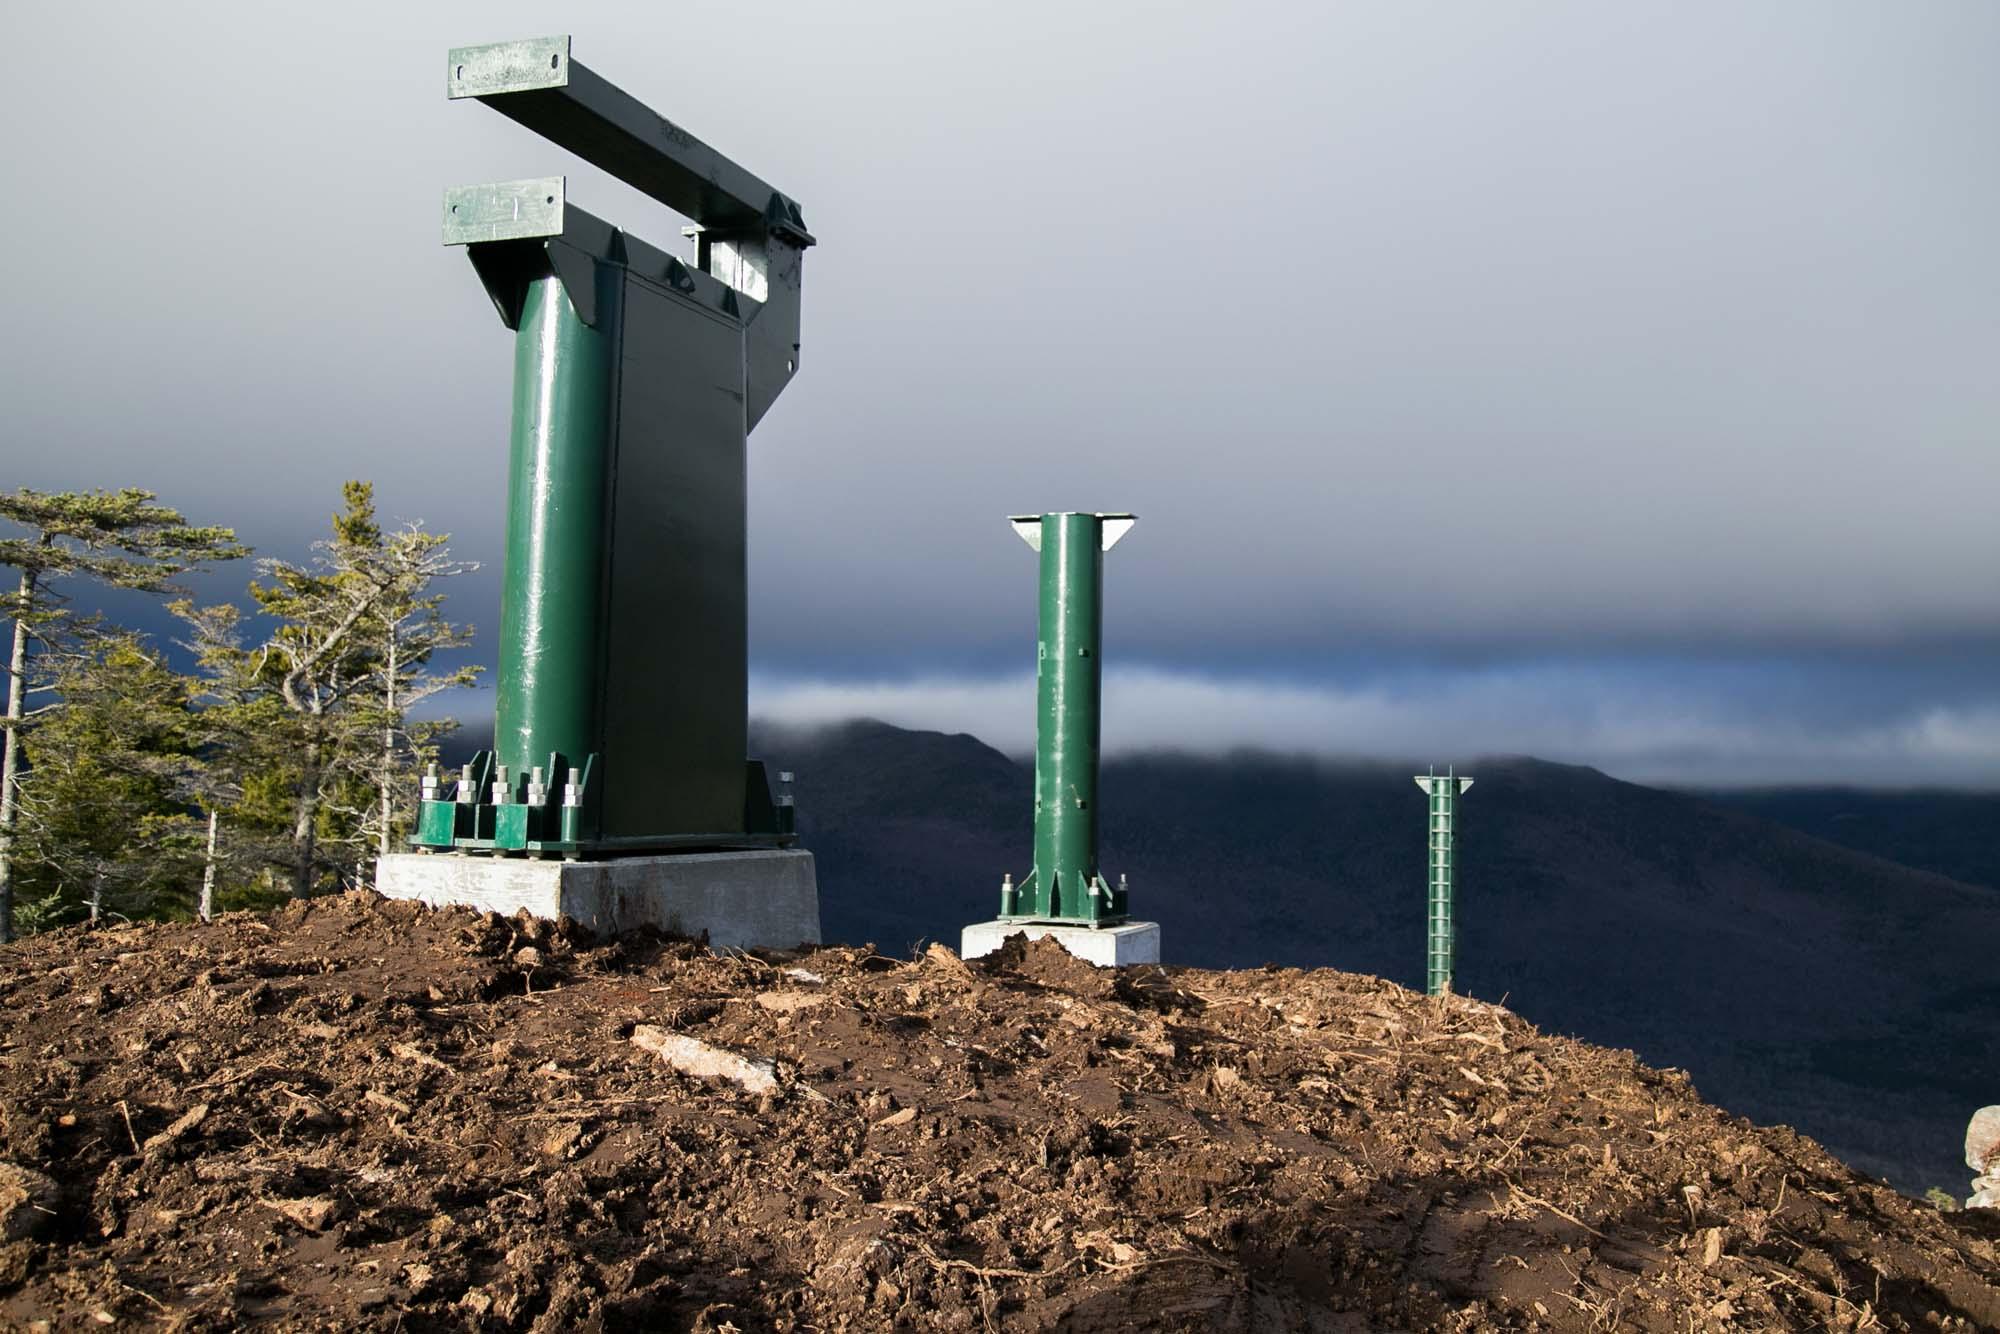 New Green Peak lift towners